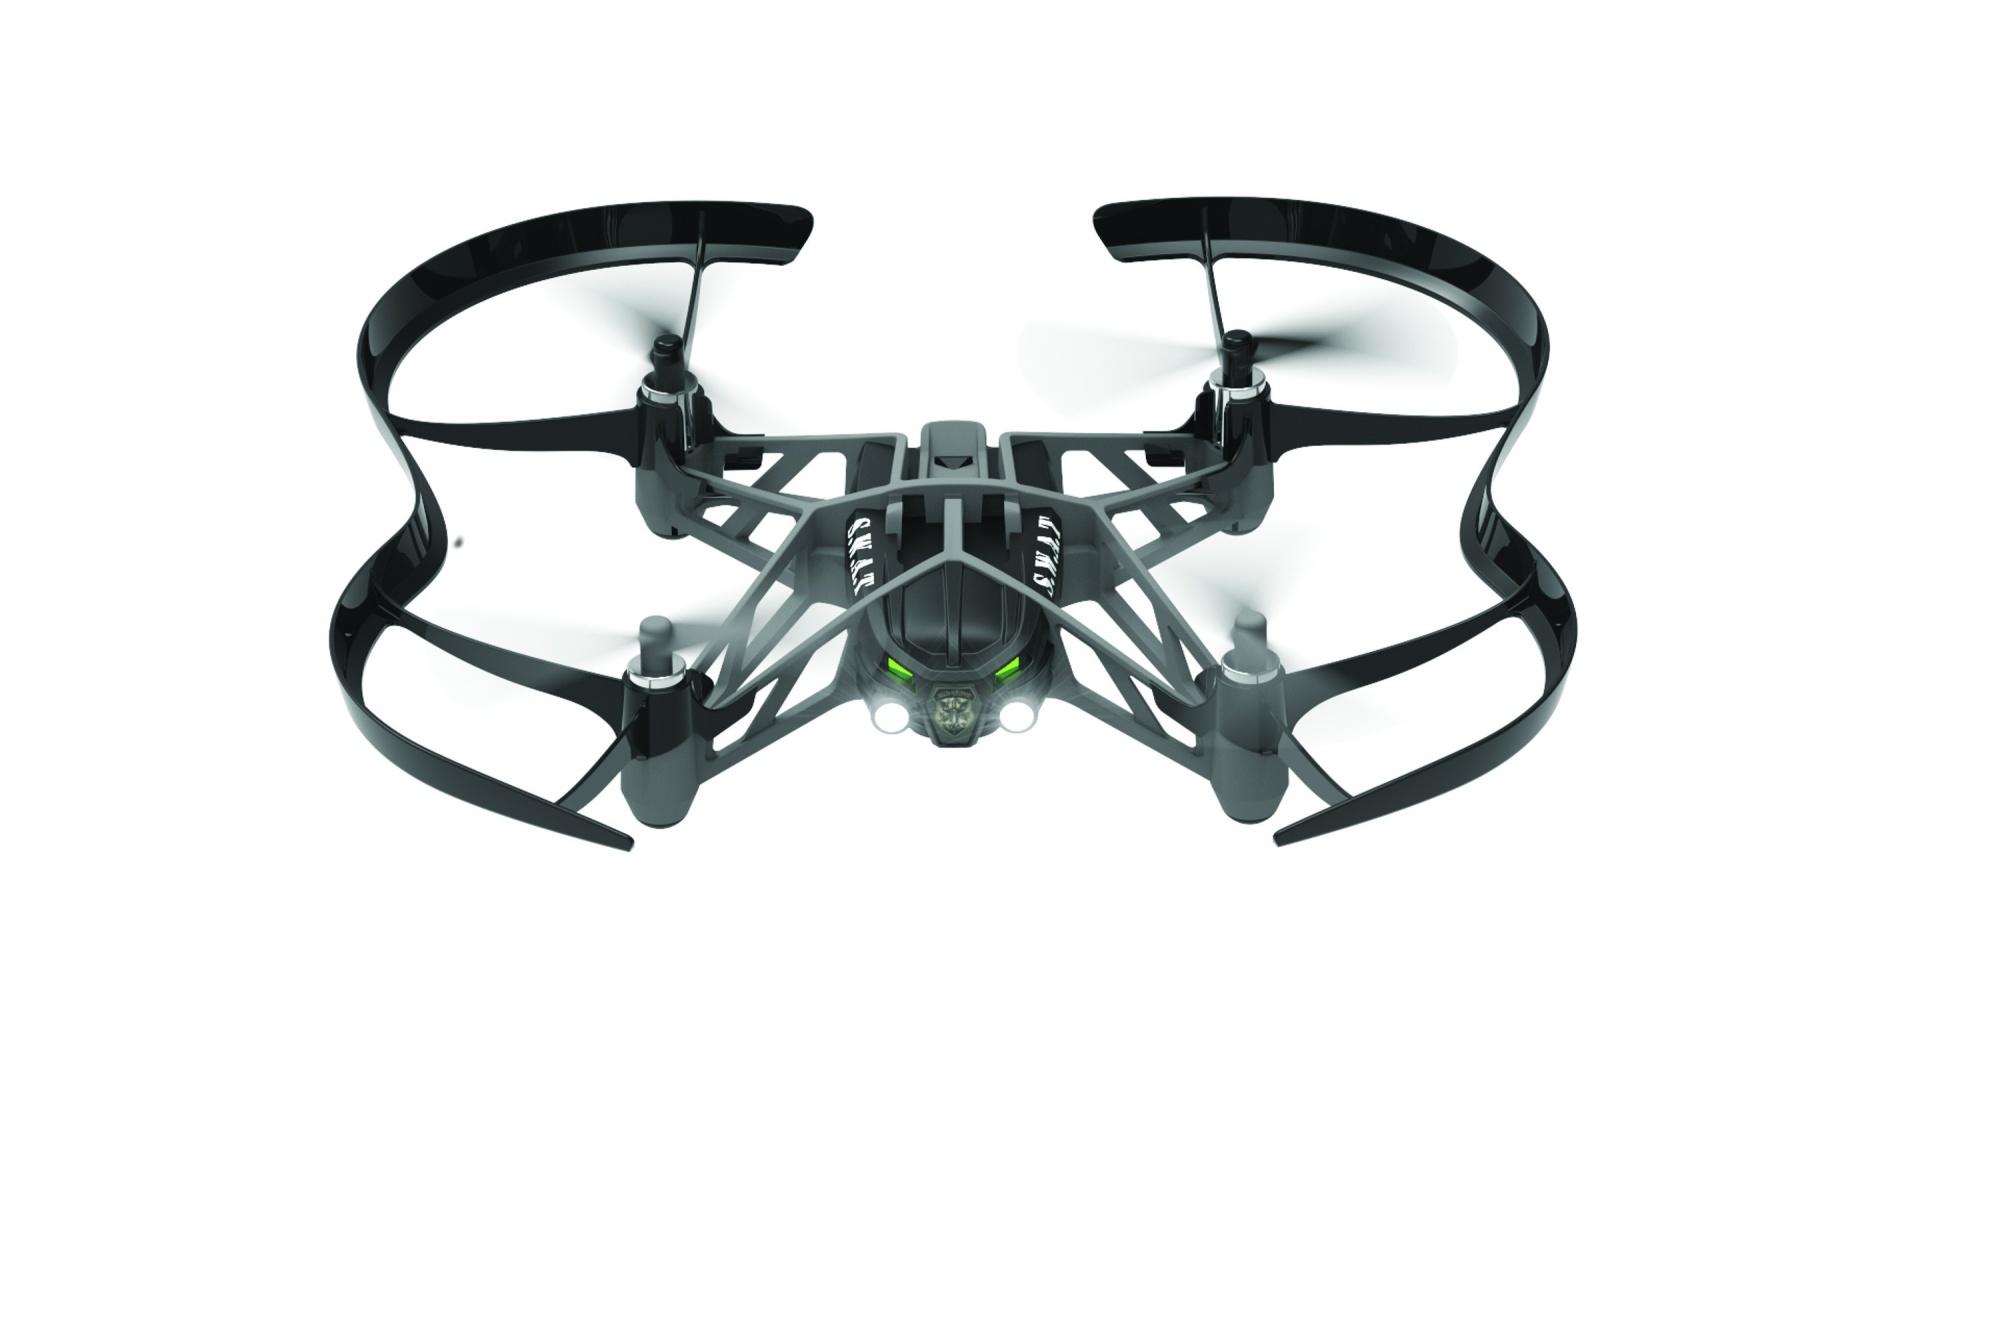 parrot airborne night mini drone swat ebay. Black Bedroom Furniture Sets. Home Design Ideas